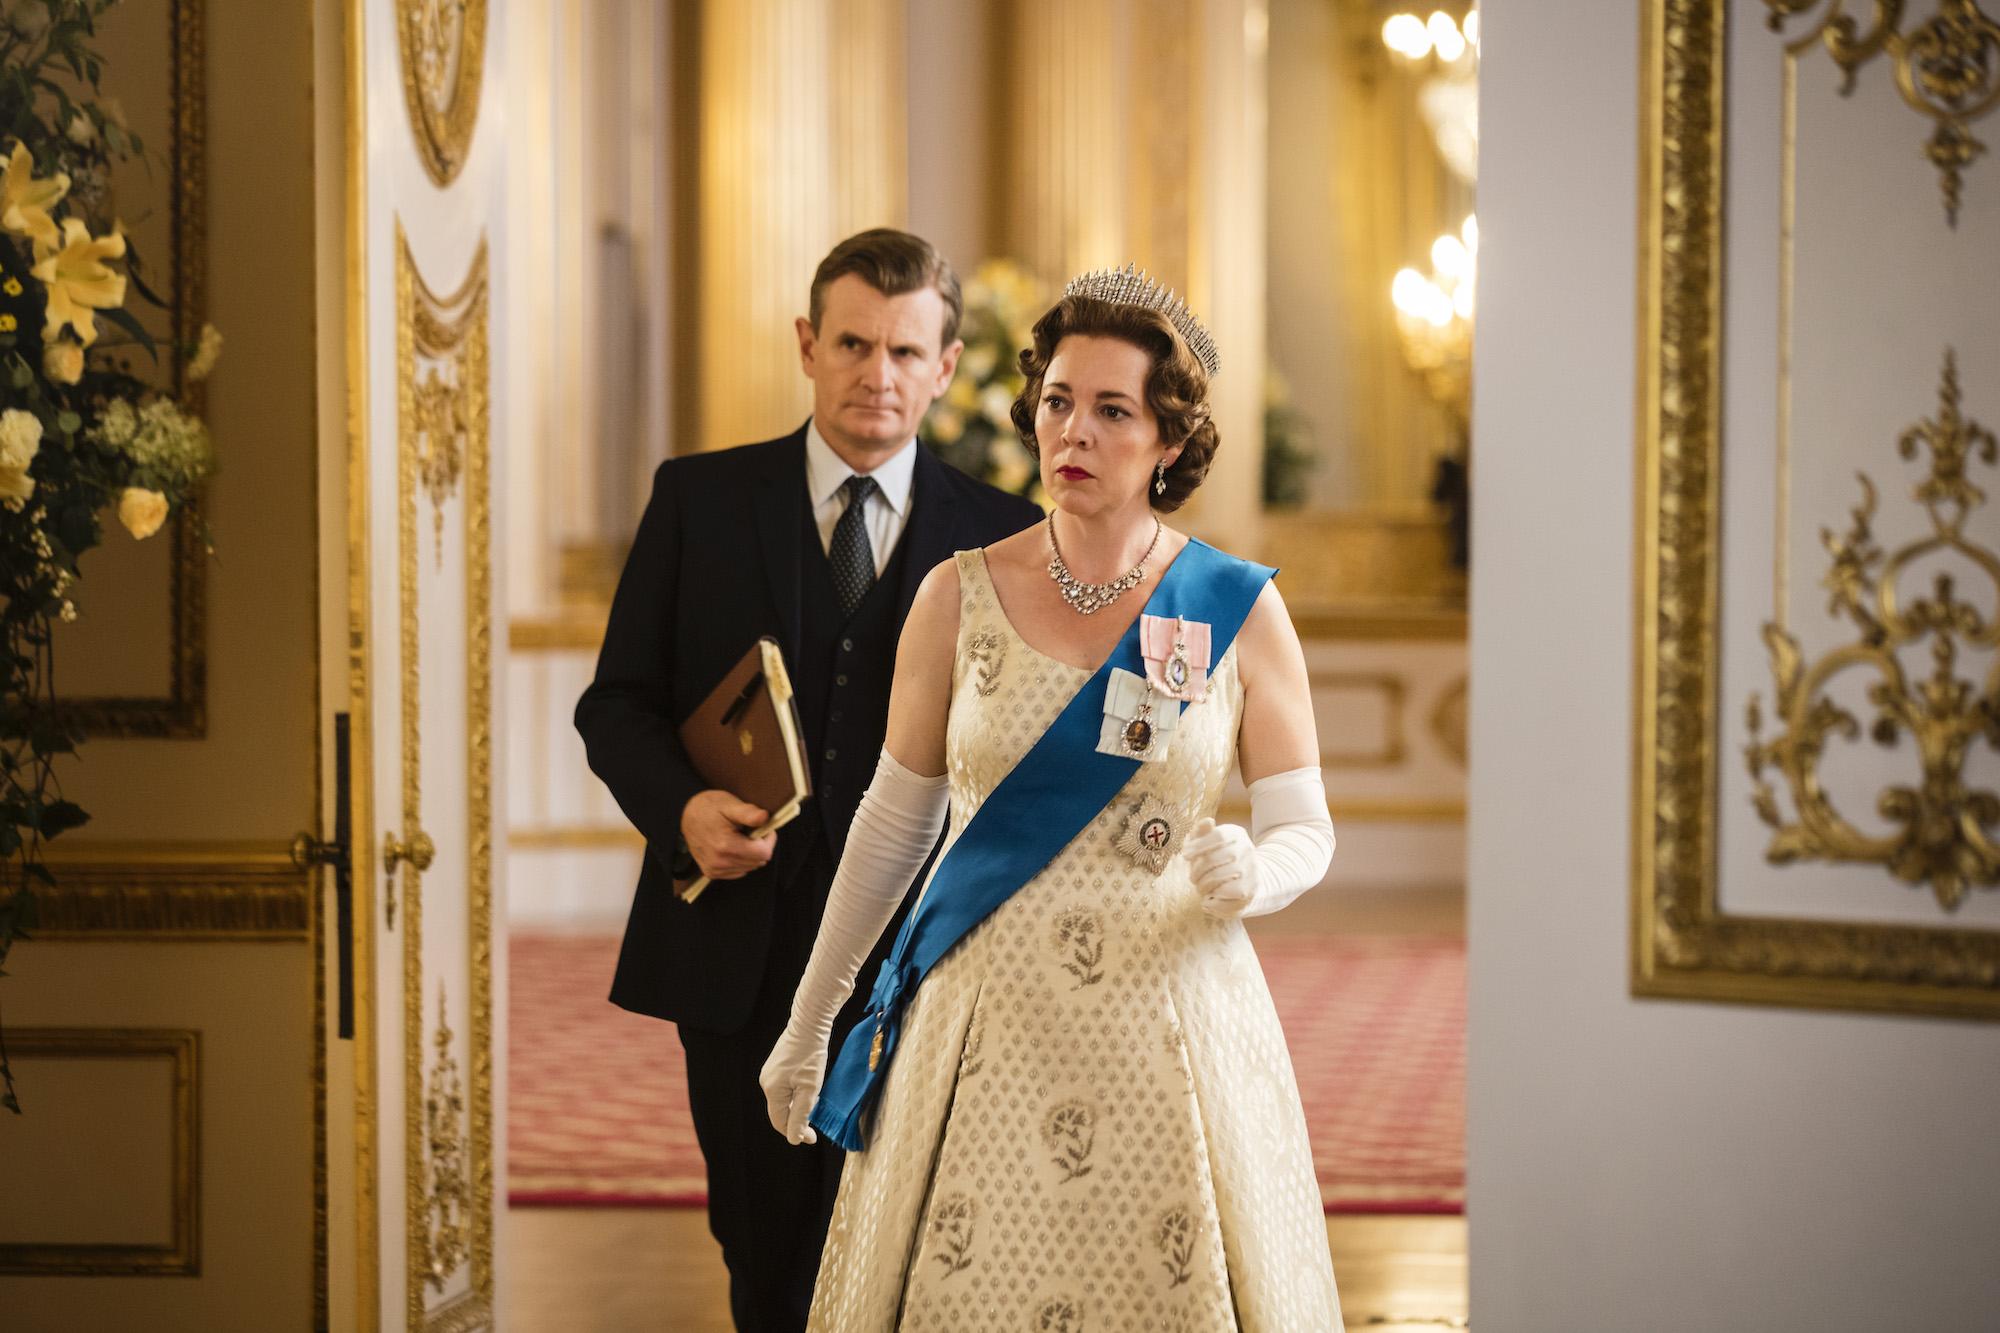 Olivia Coleman as Queen Elizabeth II in Season 3 of 'The Crown'